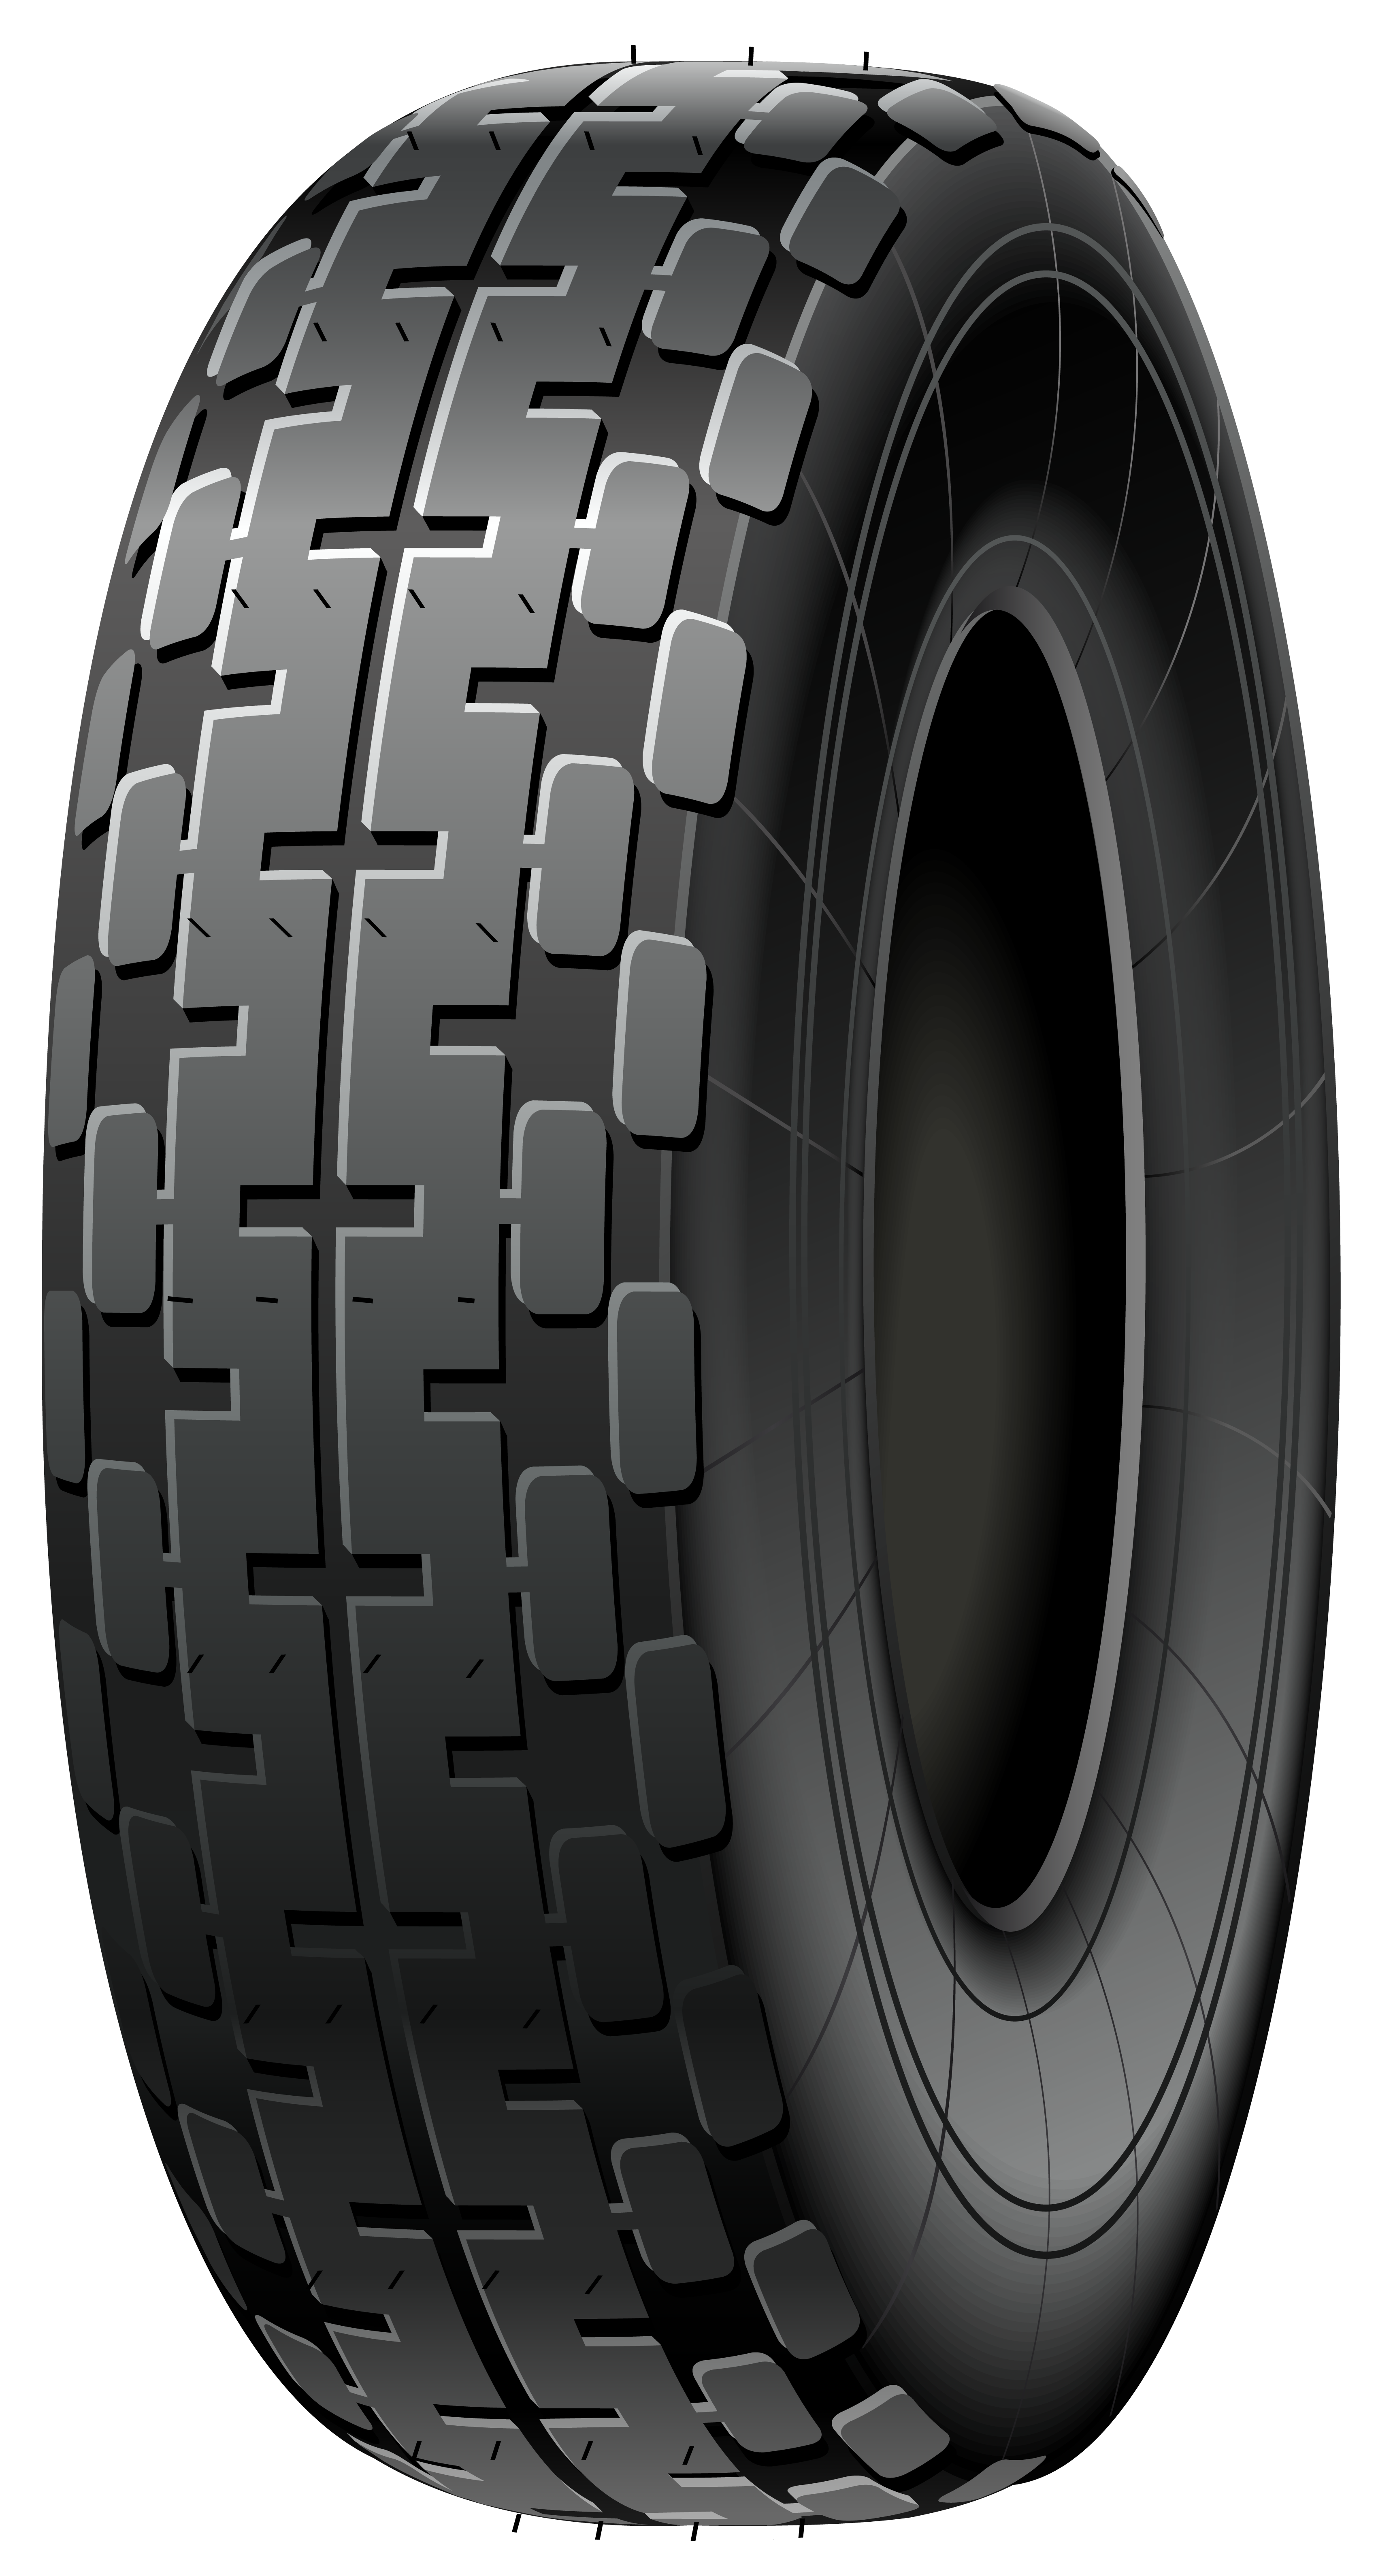 Tire clipart high resolution vector download Black Car Tire PNG Clip Art - Best WEB Clipart vector download